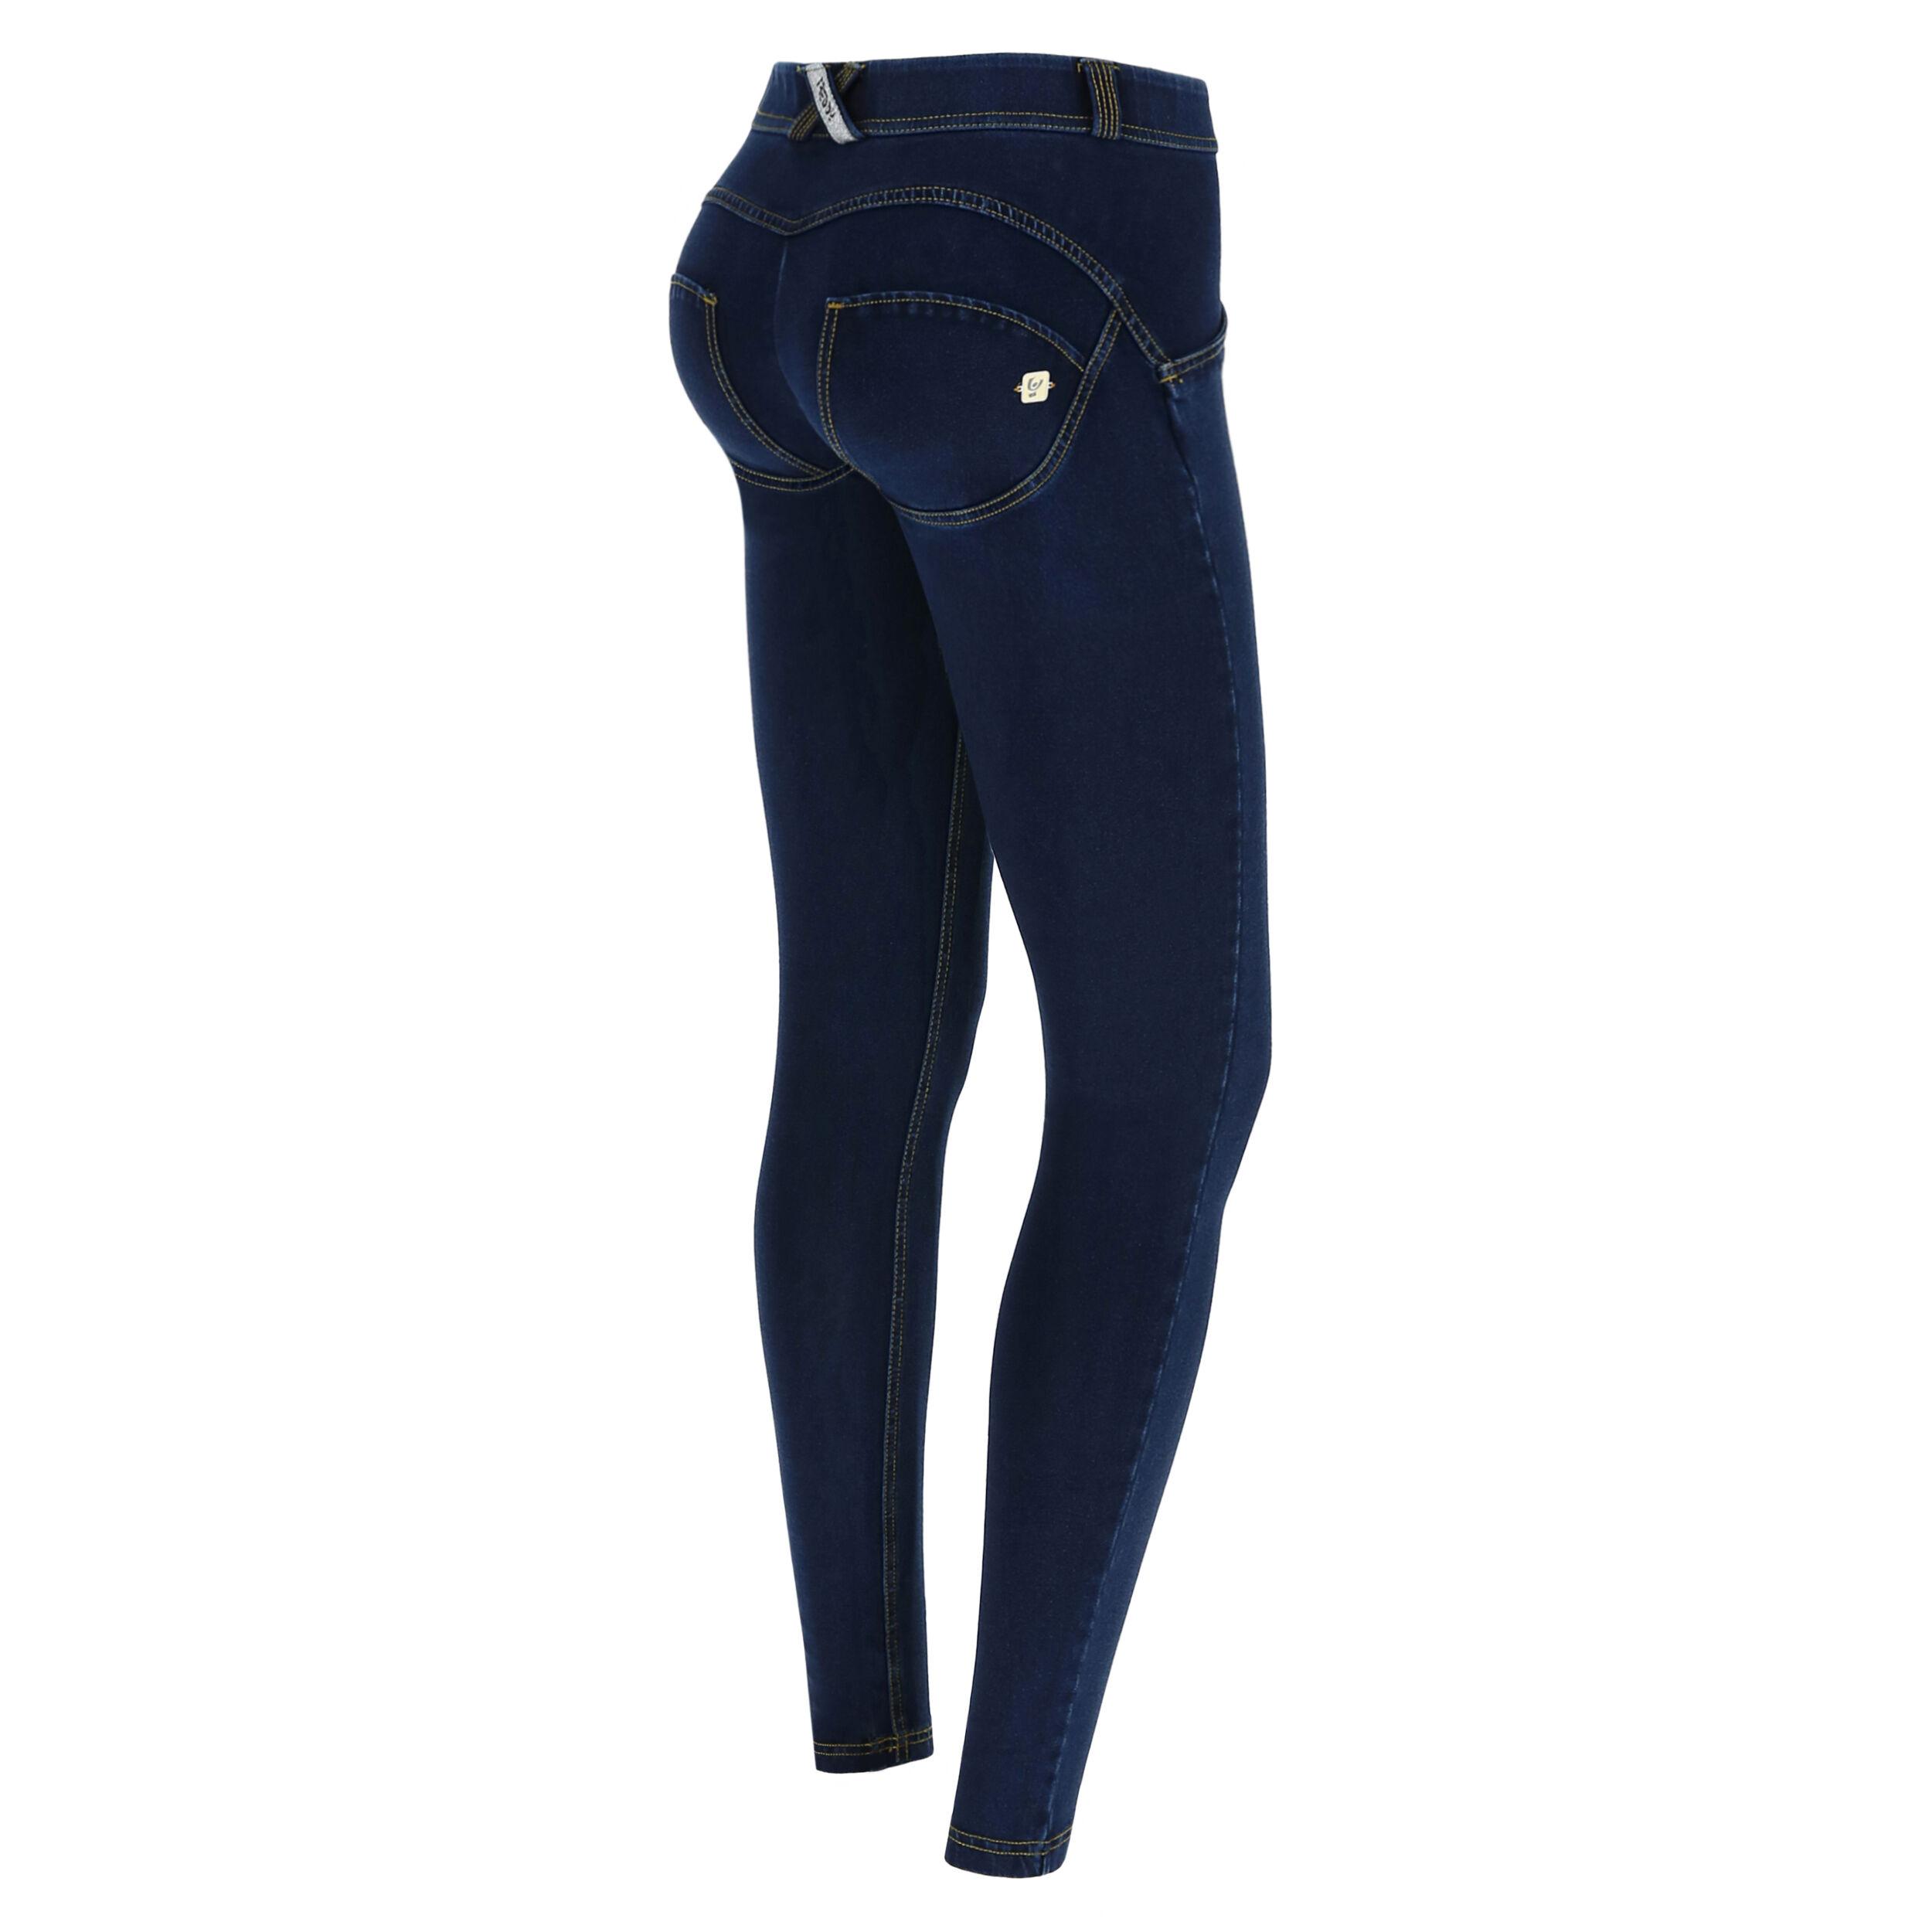 Freddy WR.UP® regular-rise skinny-fit trousers in dark denim  - Woman - Dark Jeans-Yellow Seam - Size: Large